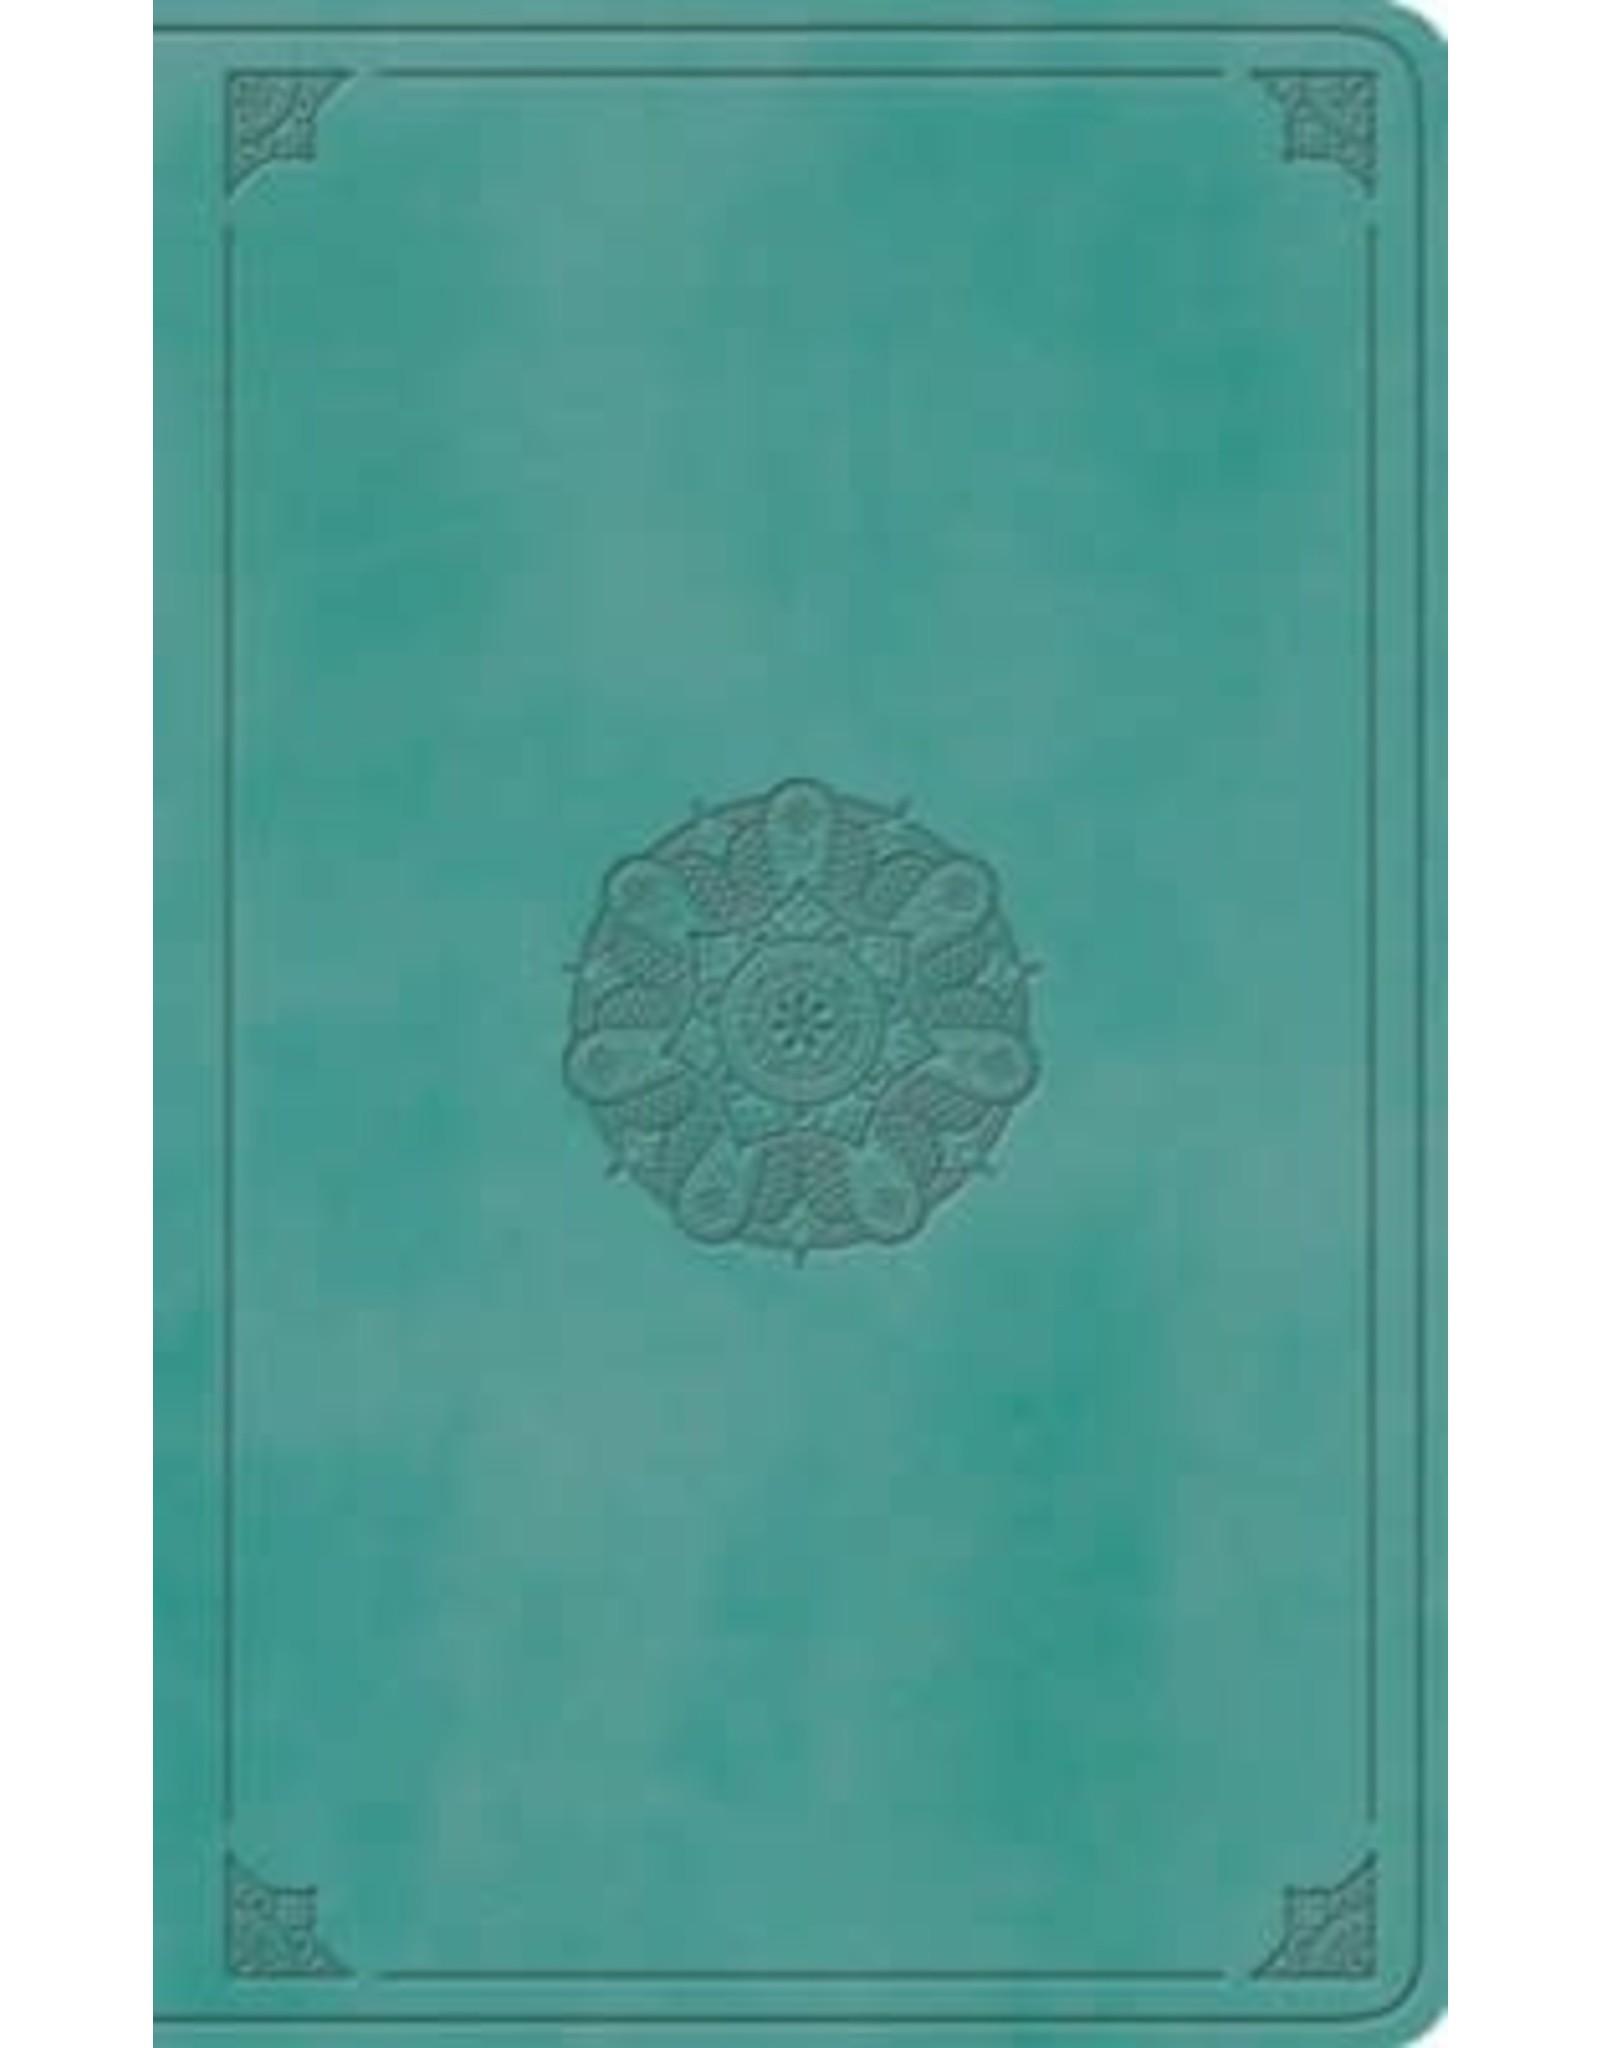 ESV Large Print Value Thinline Bible, Turquoise